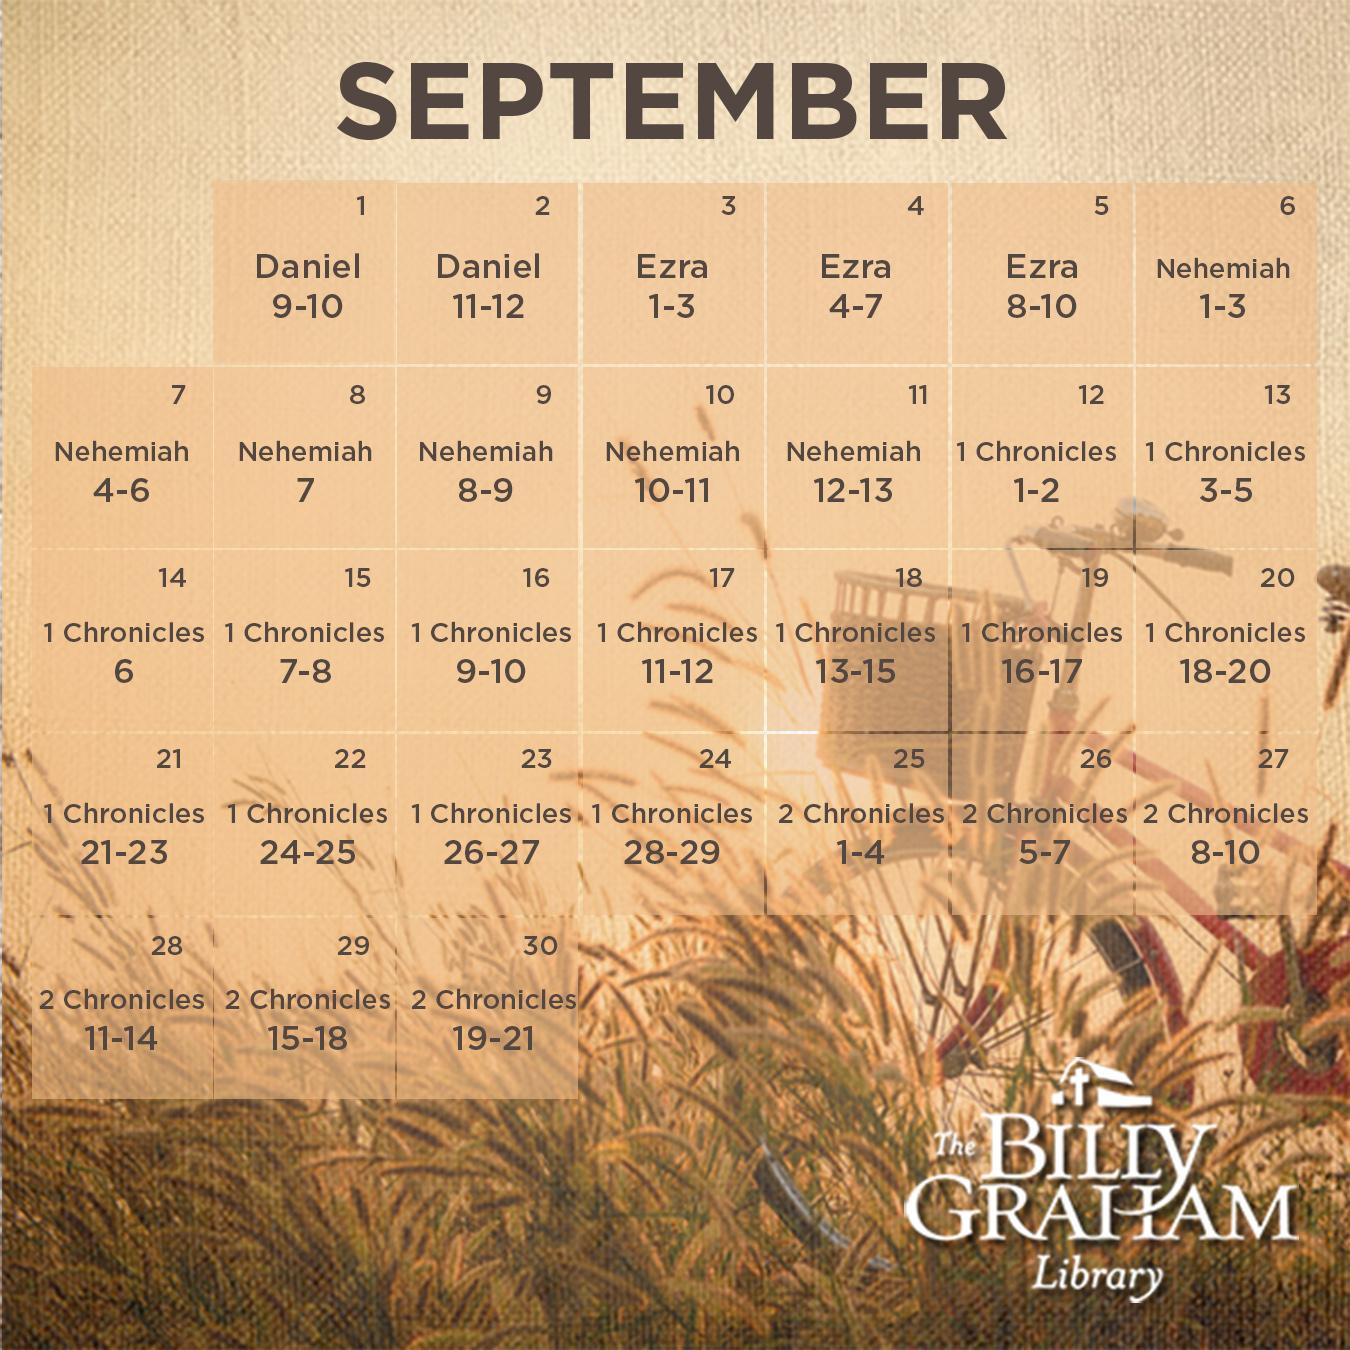 2014 September Bible Reading 4_5in